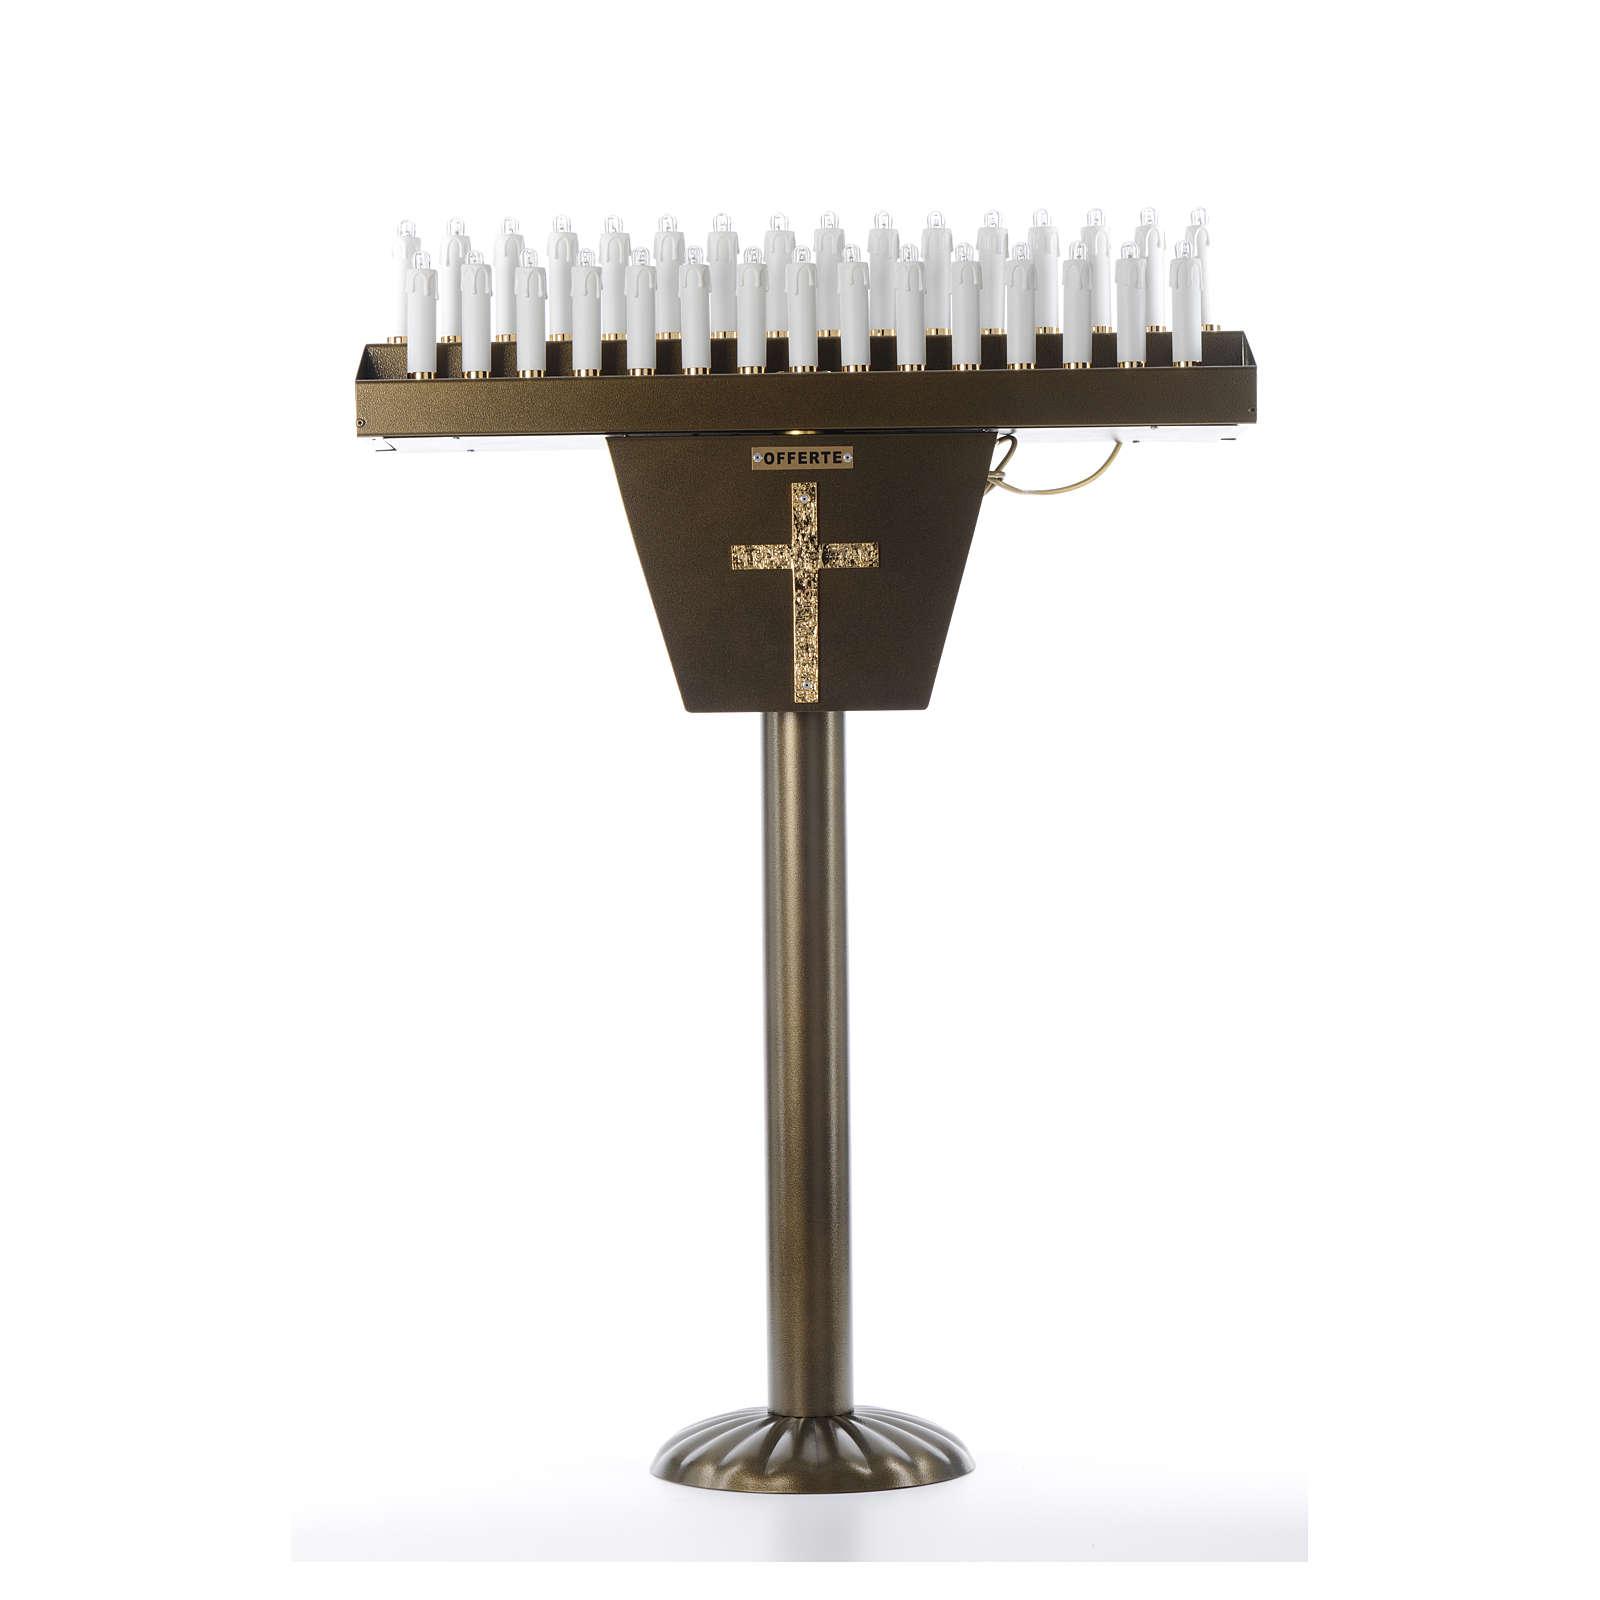 Votive candle holder, 31 LED candles 4